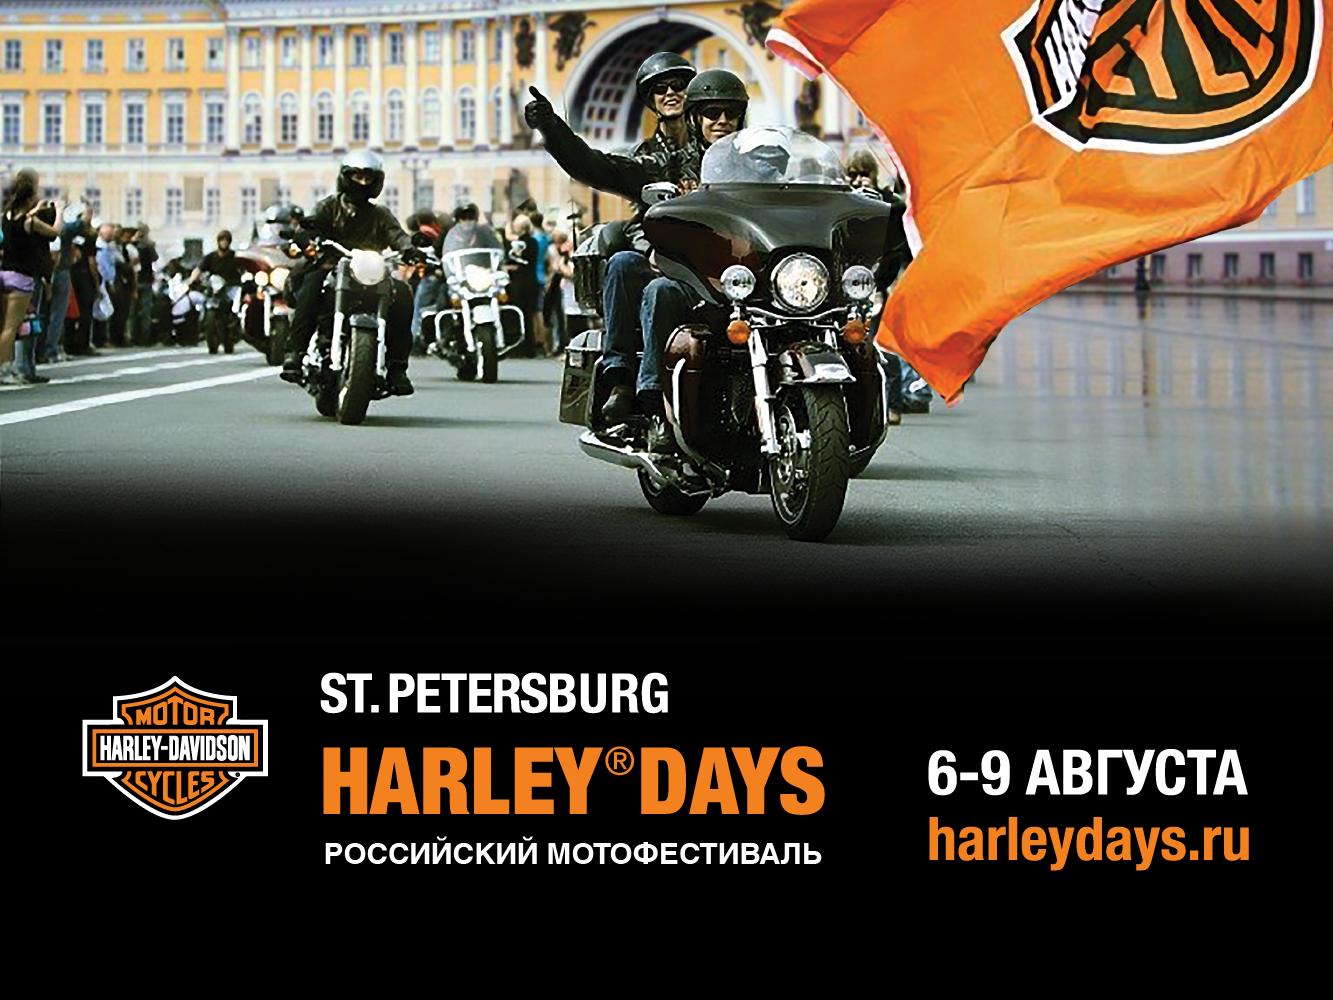 Harley Days 2015 - те самые дни